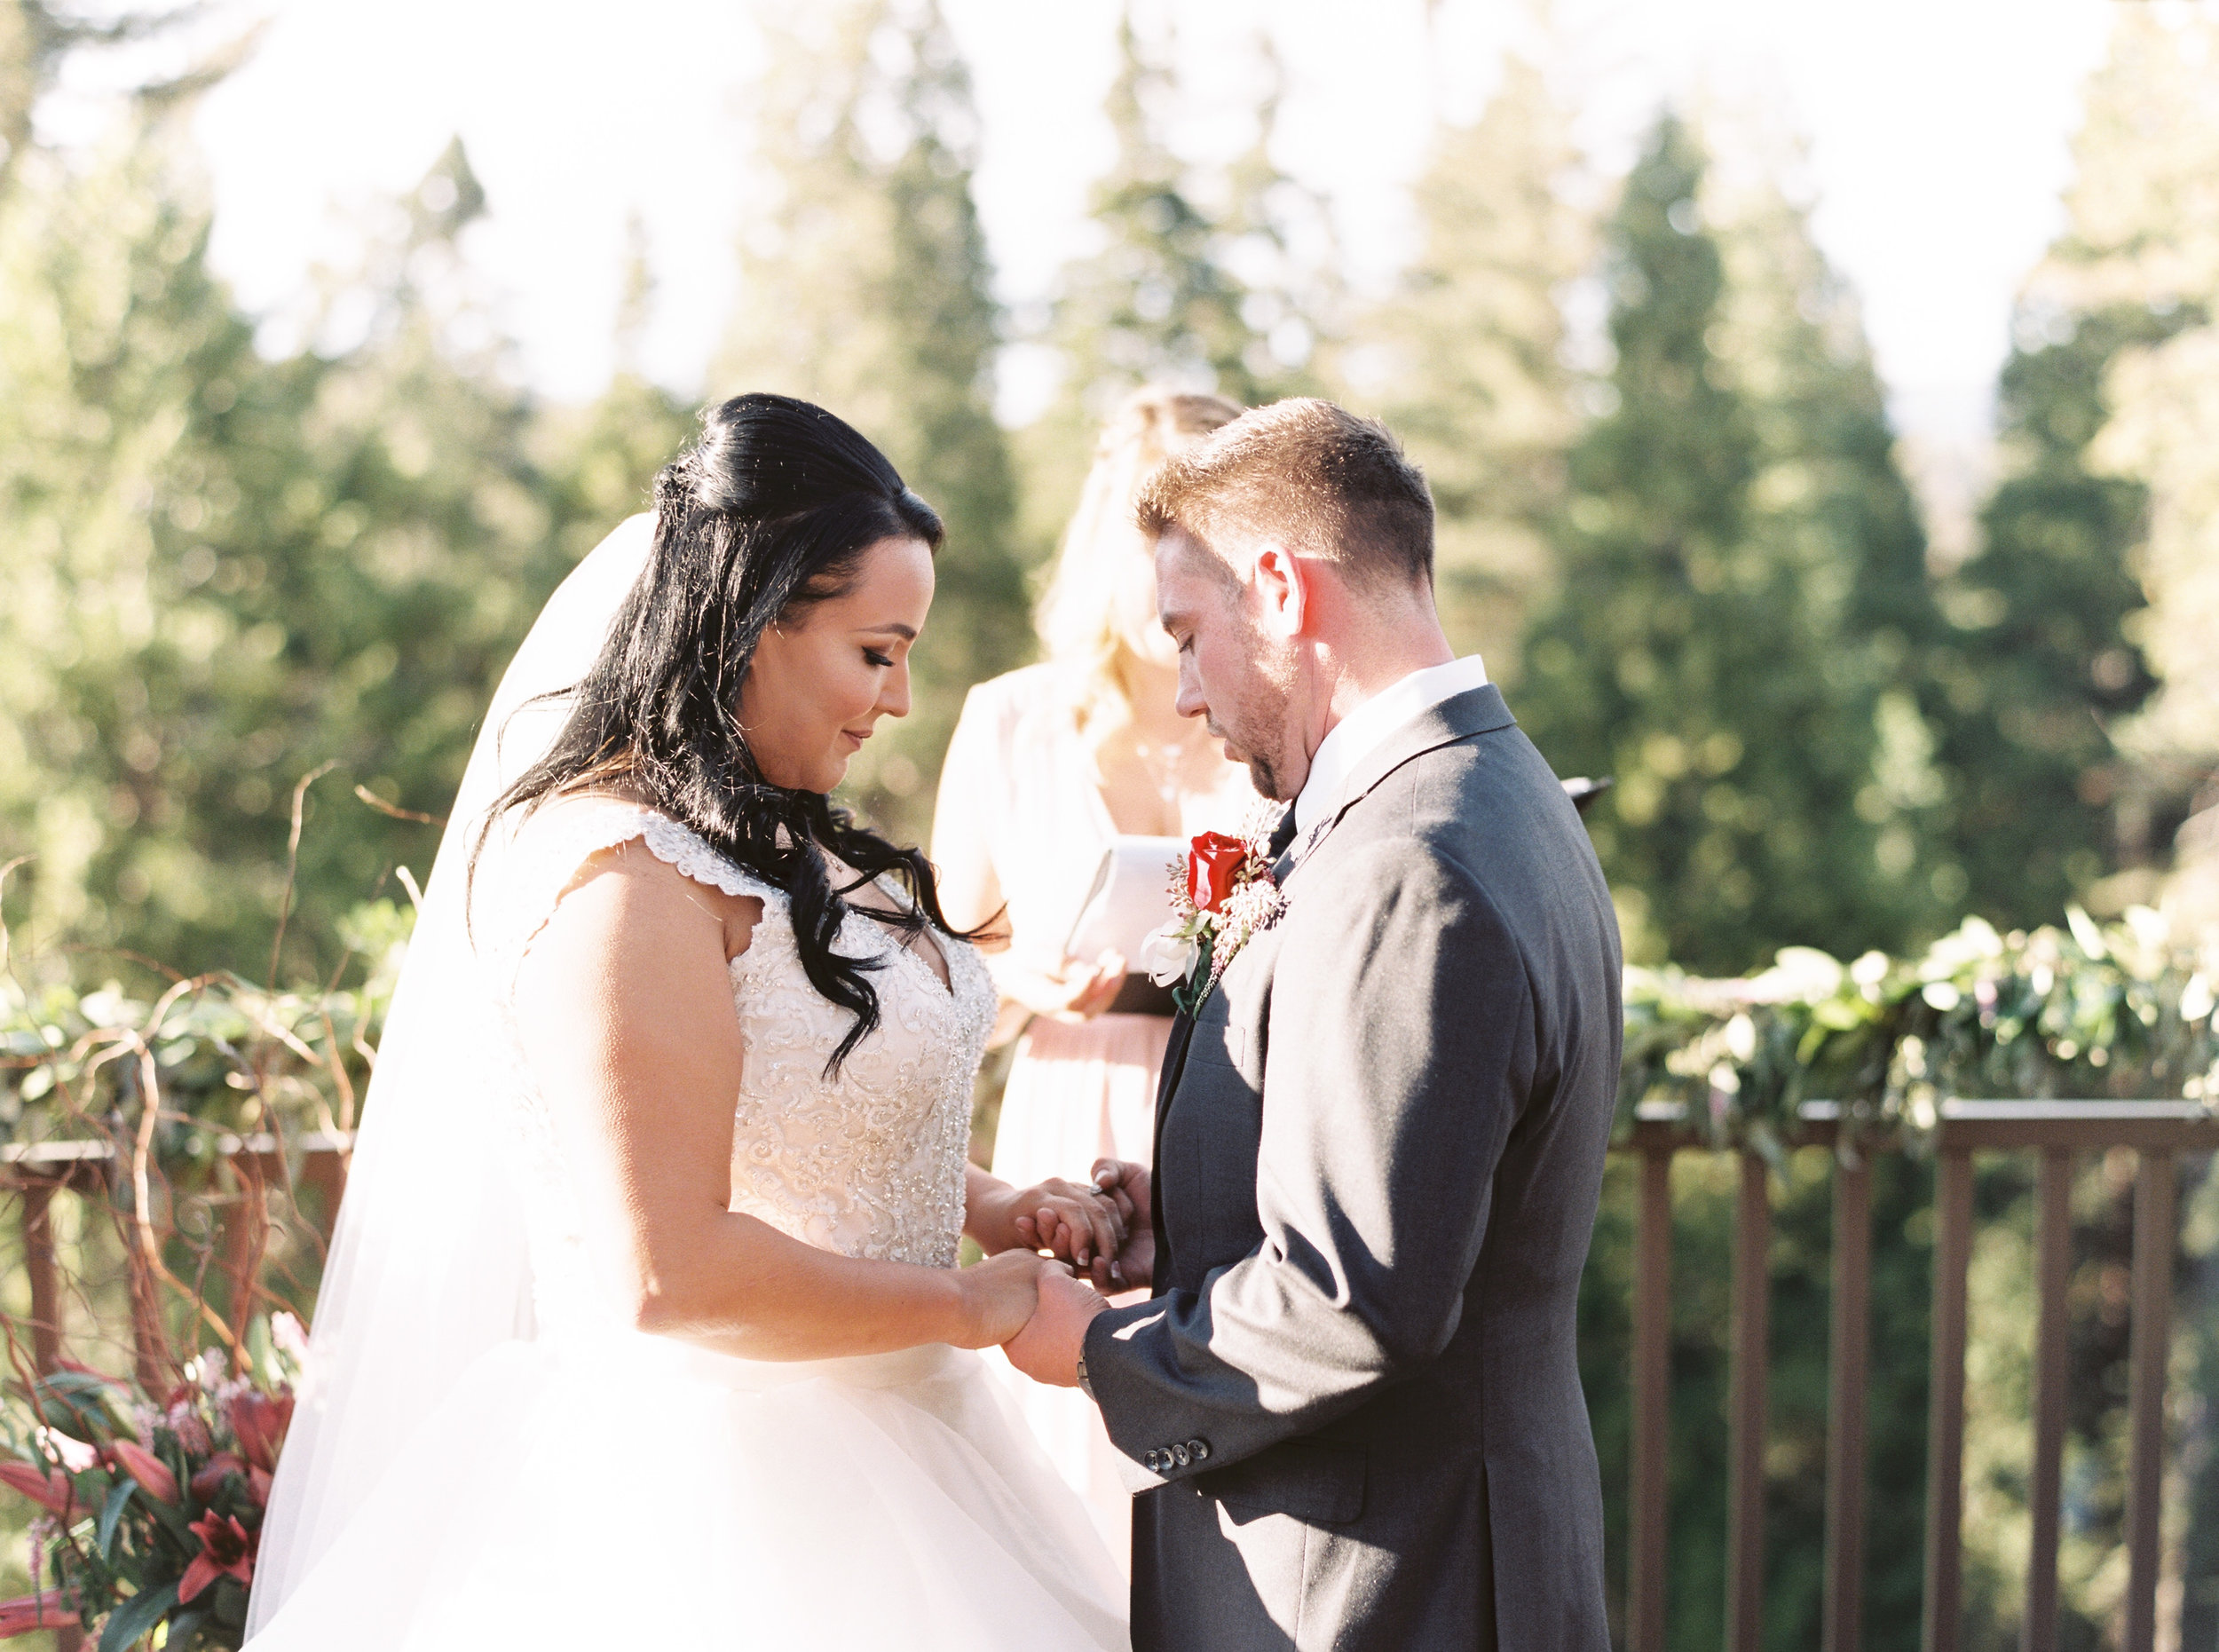 Tenaya-lodge-wedding-at-yosemite-national-park-california-80.jpg